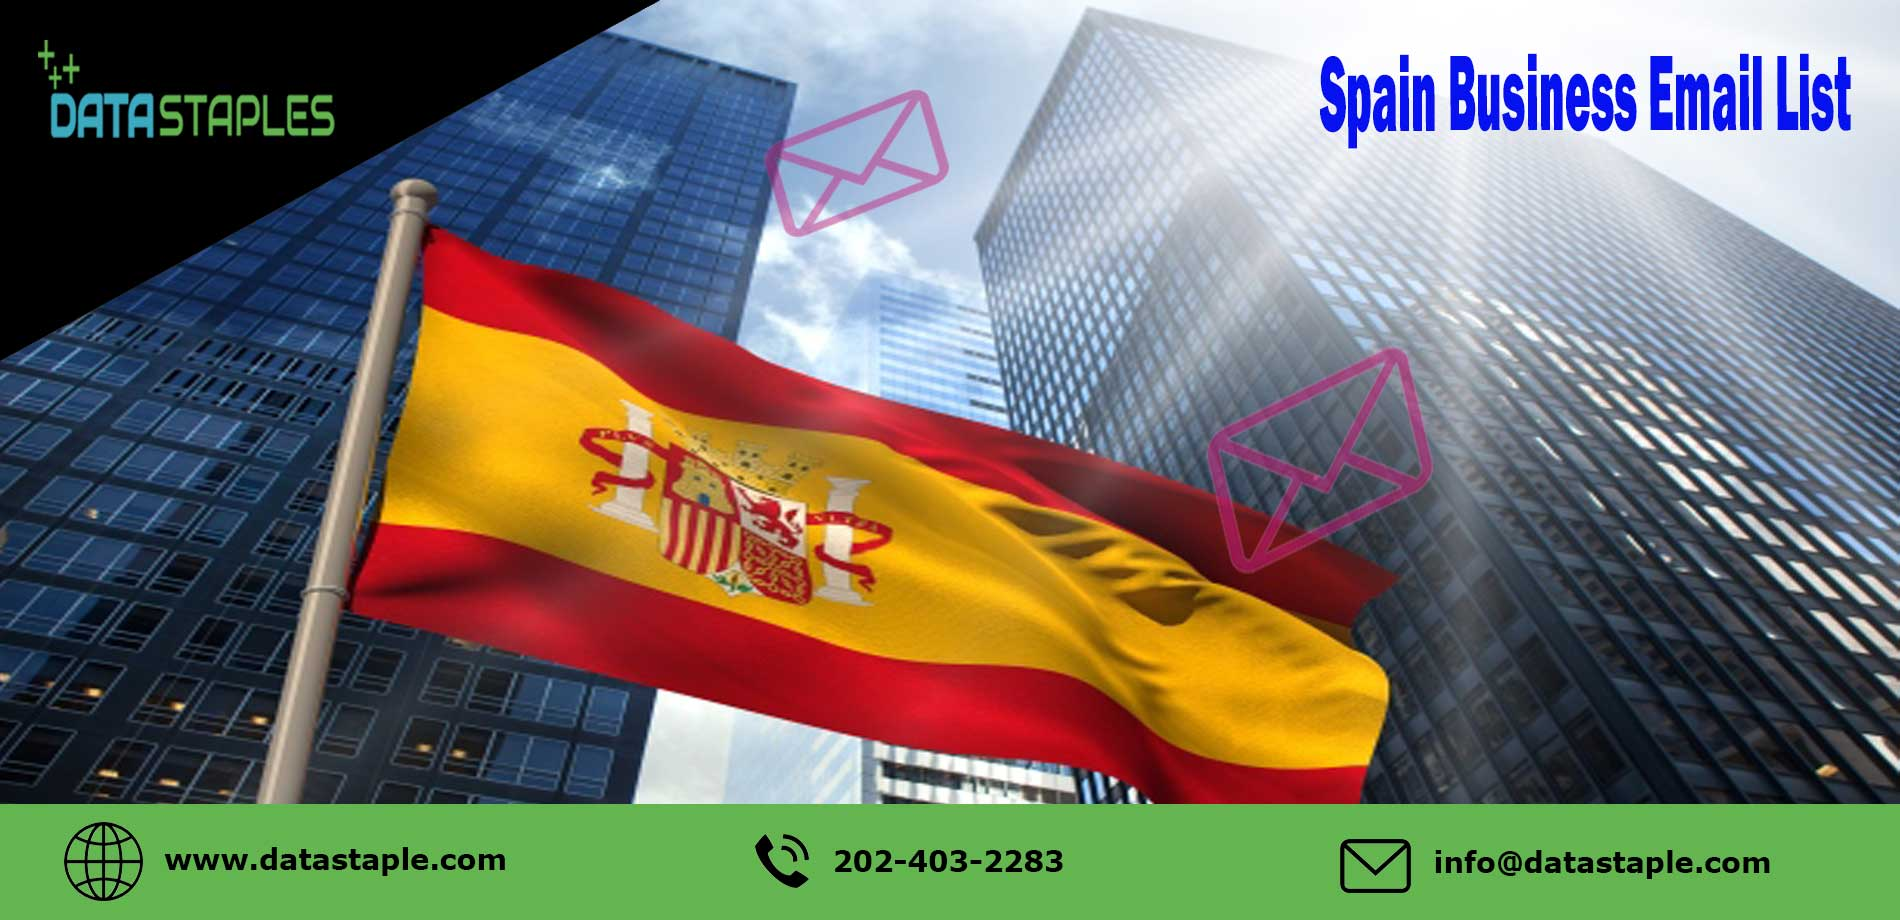 Spain Business Email List   DataStaples